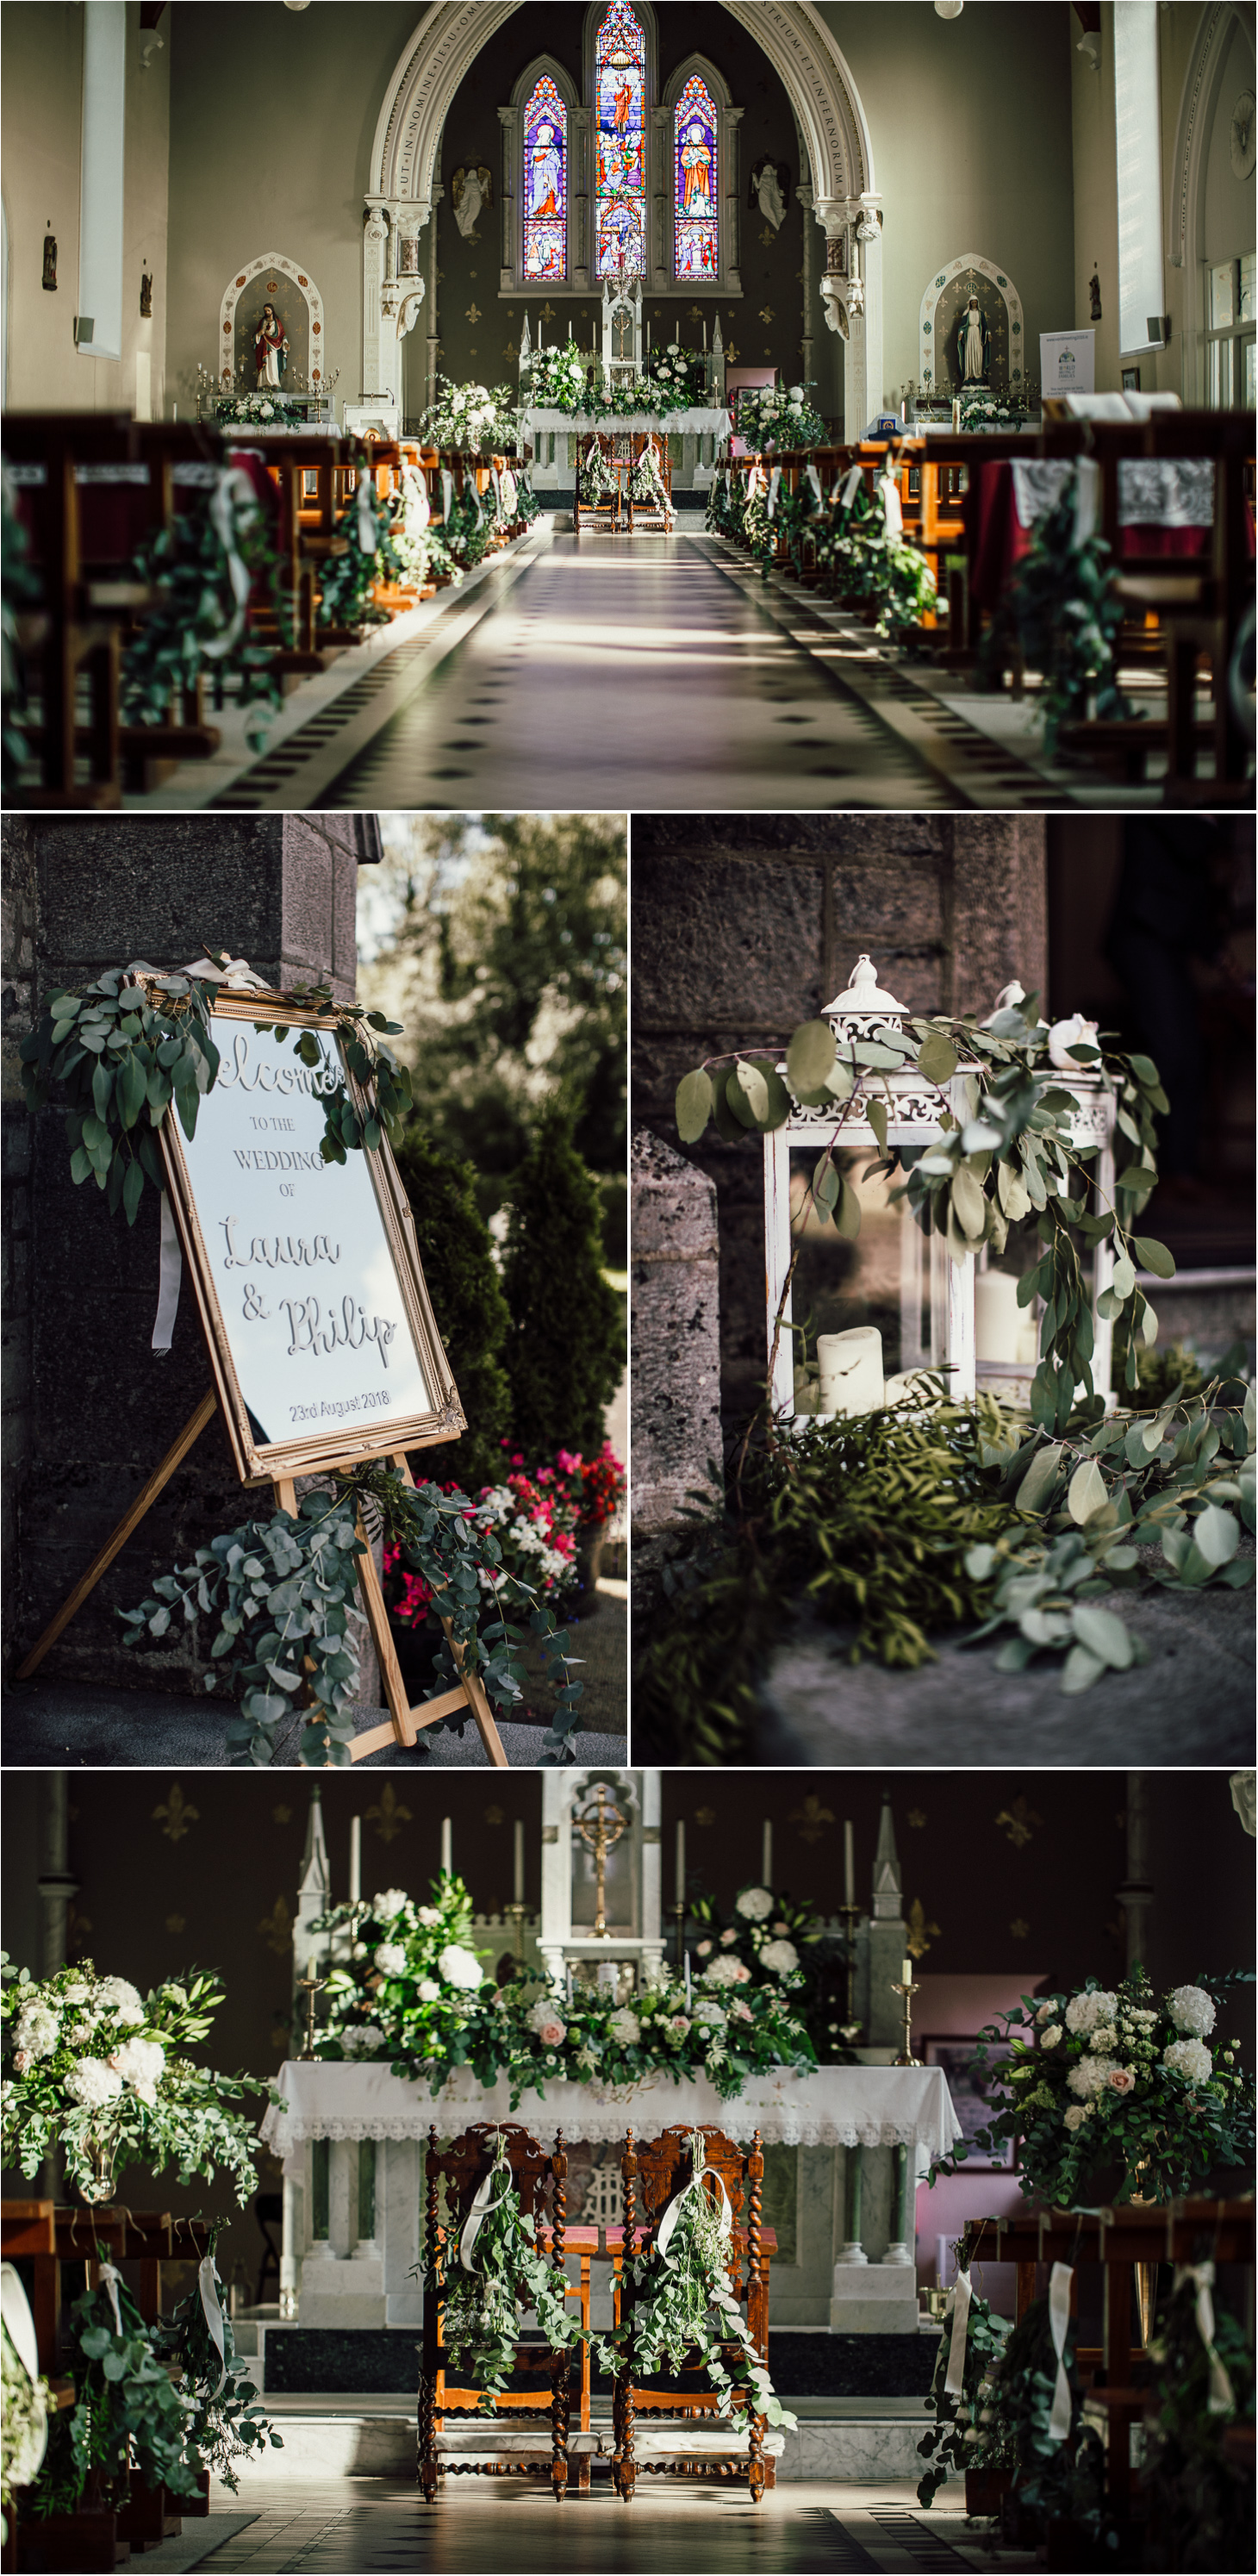 Virgina Lodge Photography. darren fitzpatrick. Wedding.5